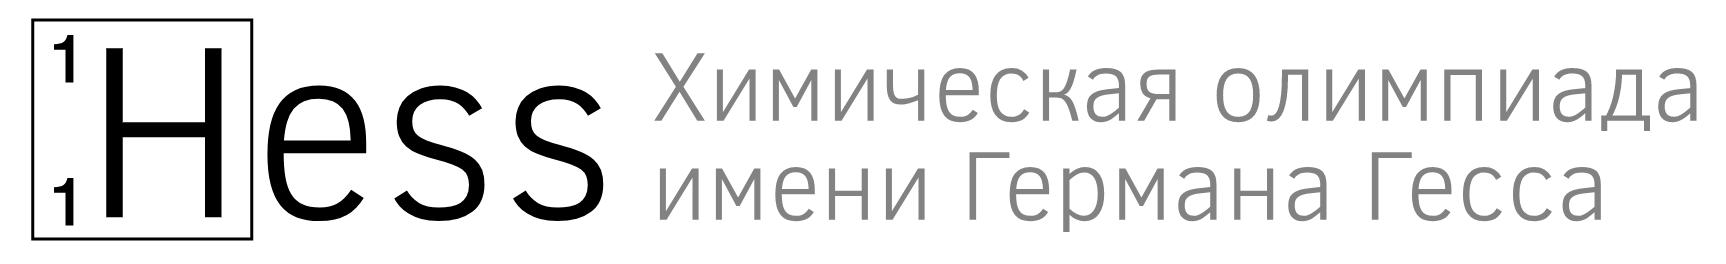 Олимпиада имени Германа Гесса